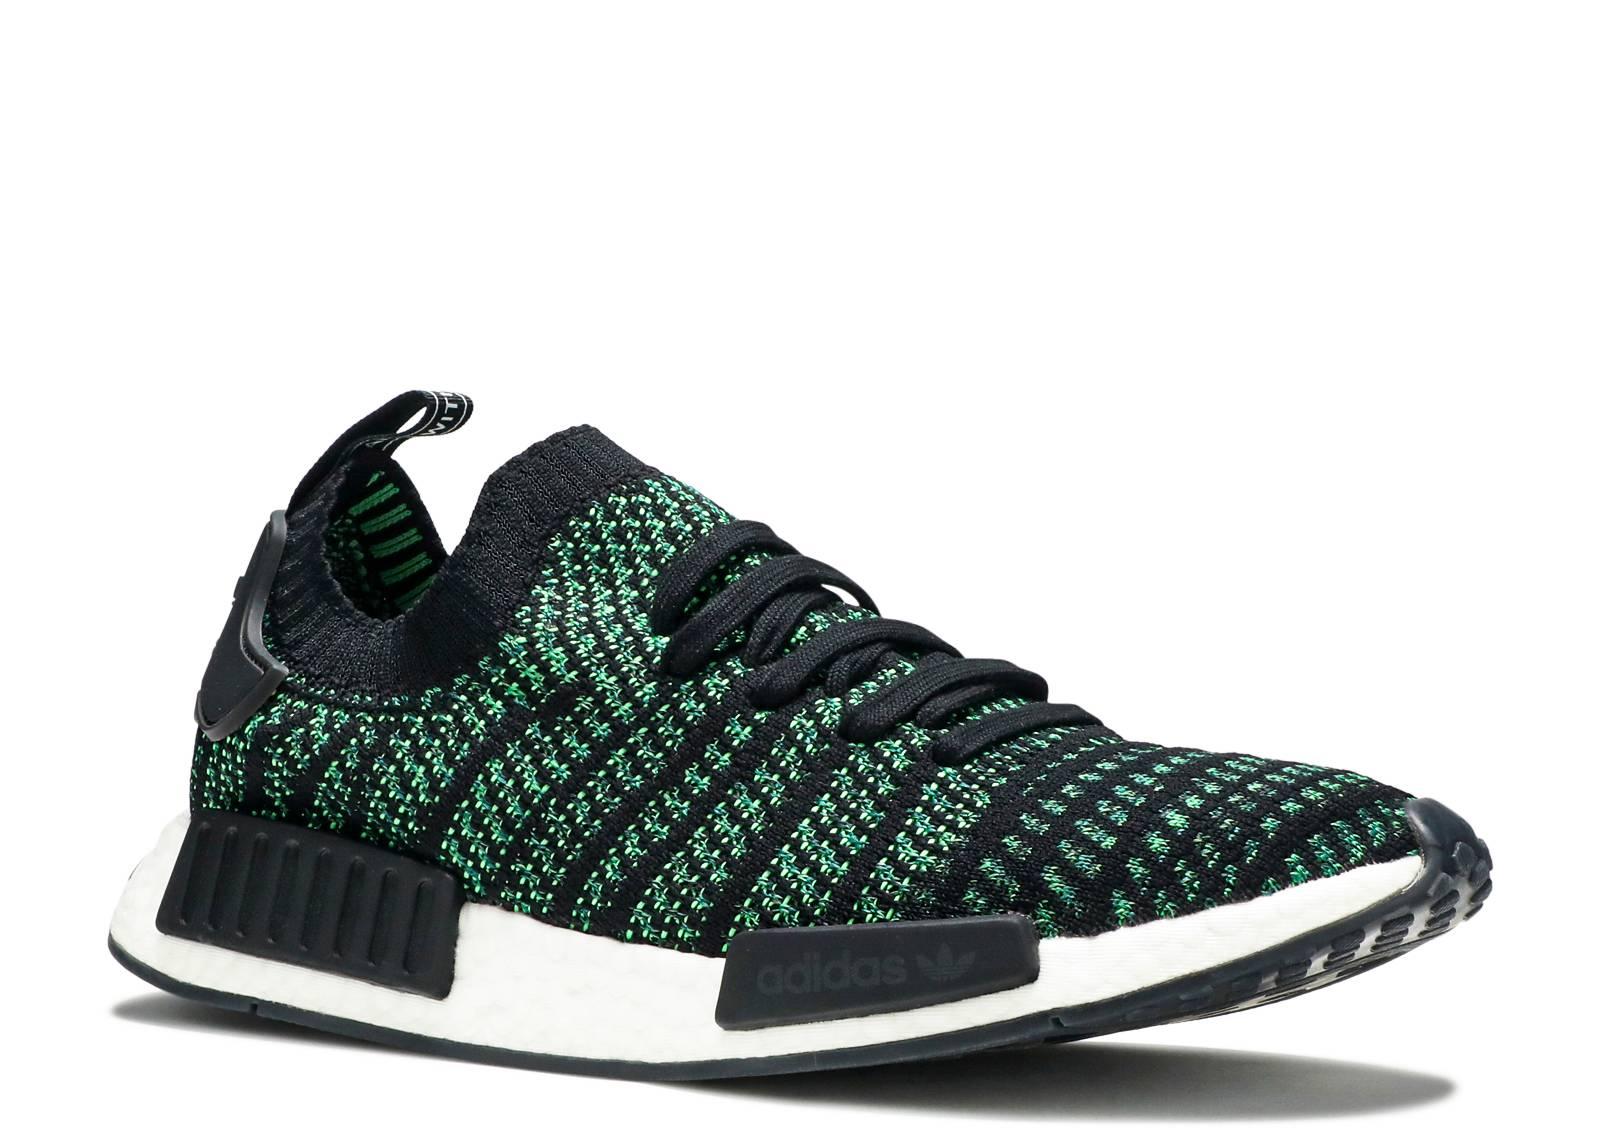 6131ab14f Nmd R1 Stlt Pk - Adidas - aq0936 - black noble green  bold green ...